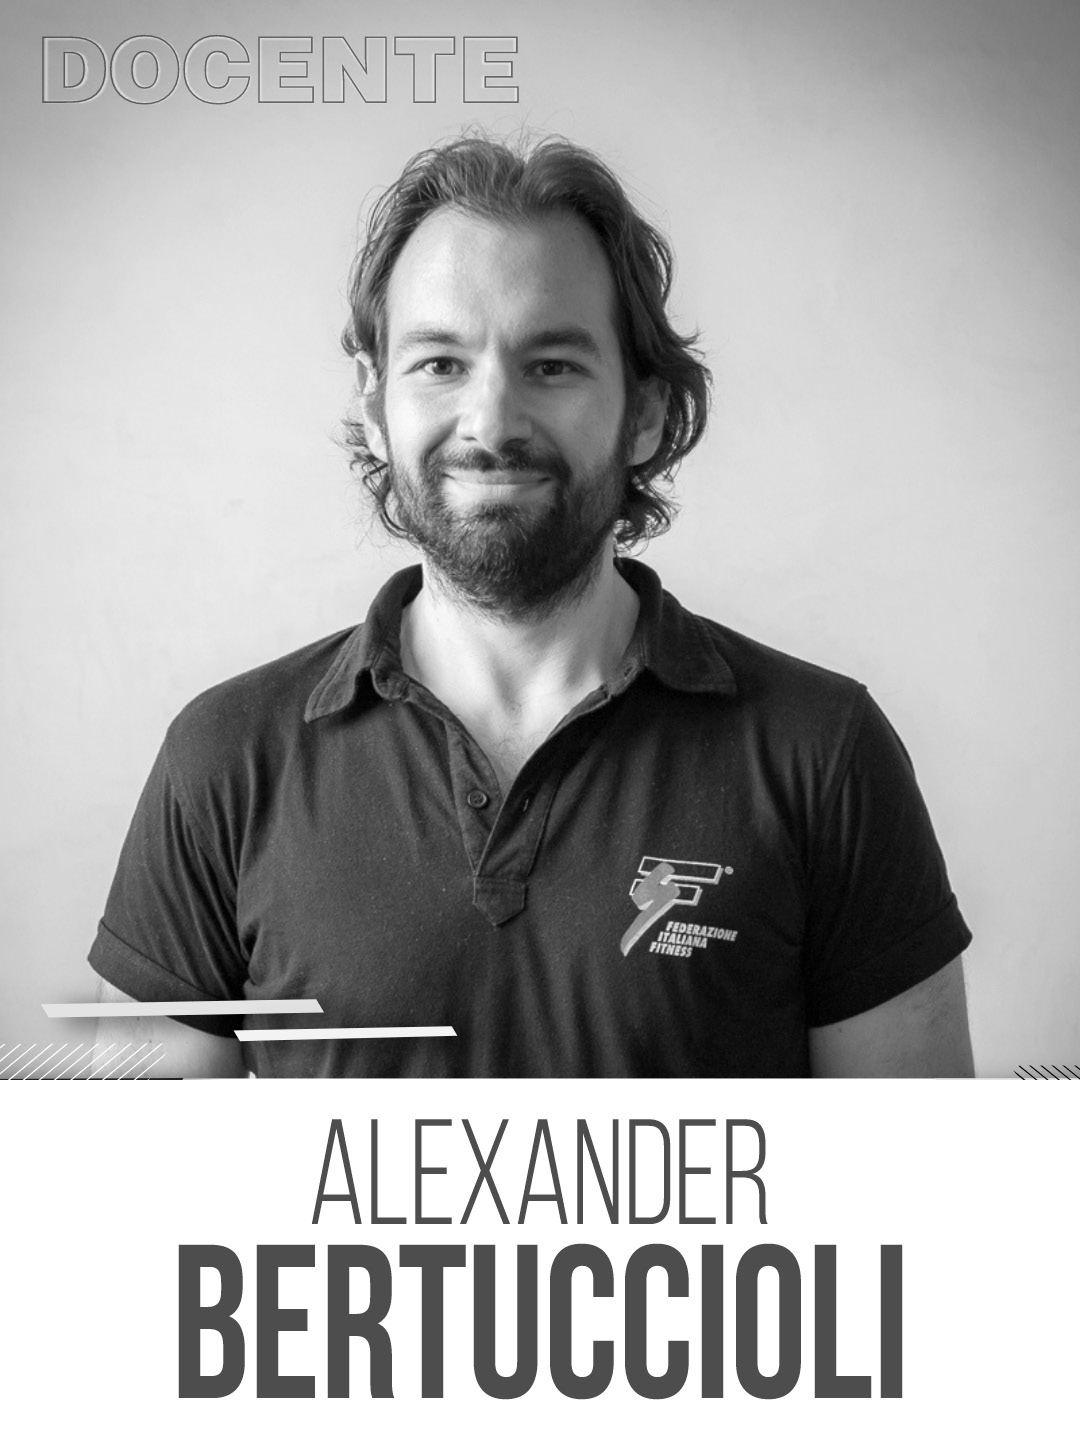 alexander bertuccioli